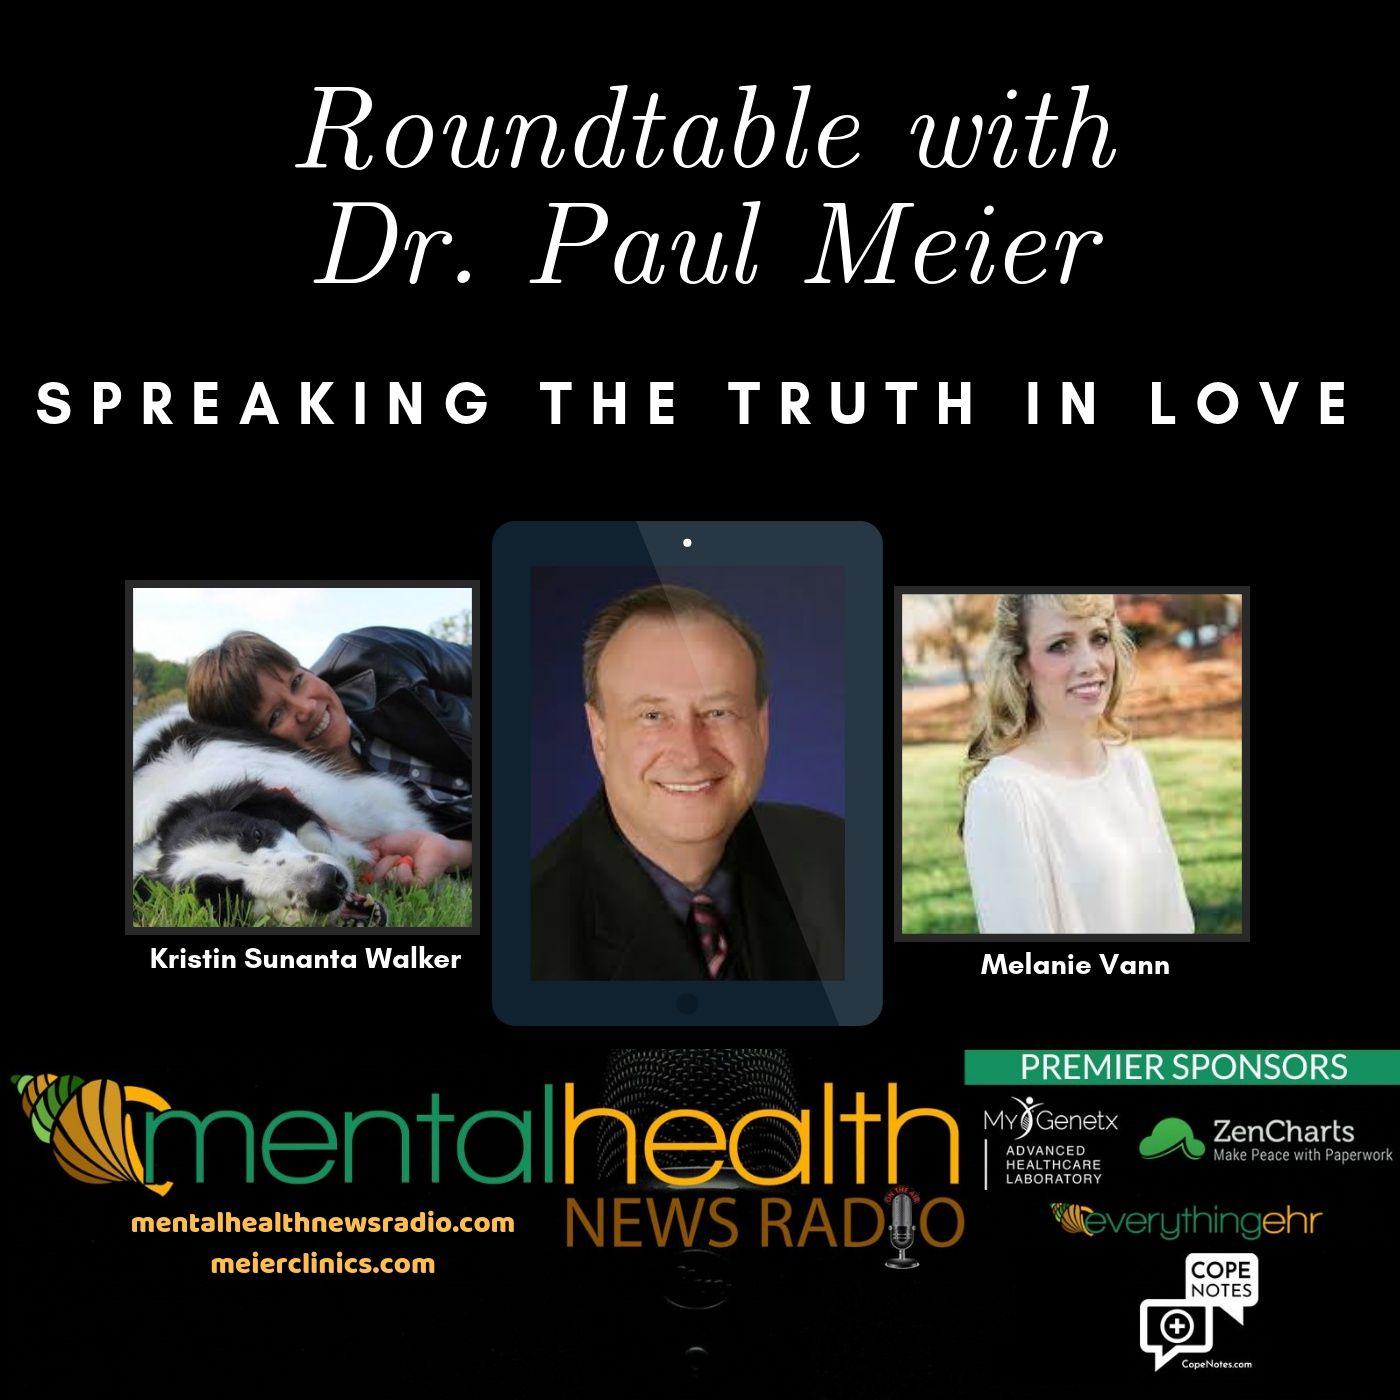 Mental Health News Radio - Roundtable Dr. Paul Meier: Speaking the Truth in Love